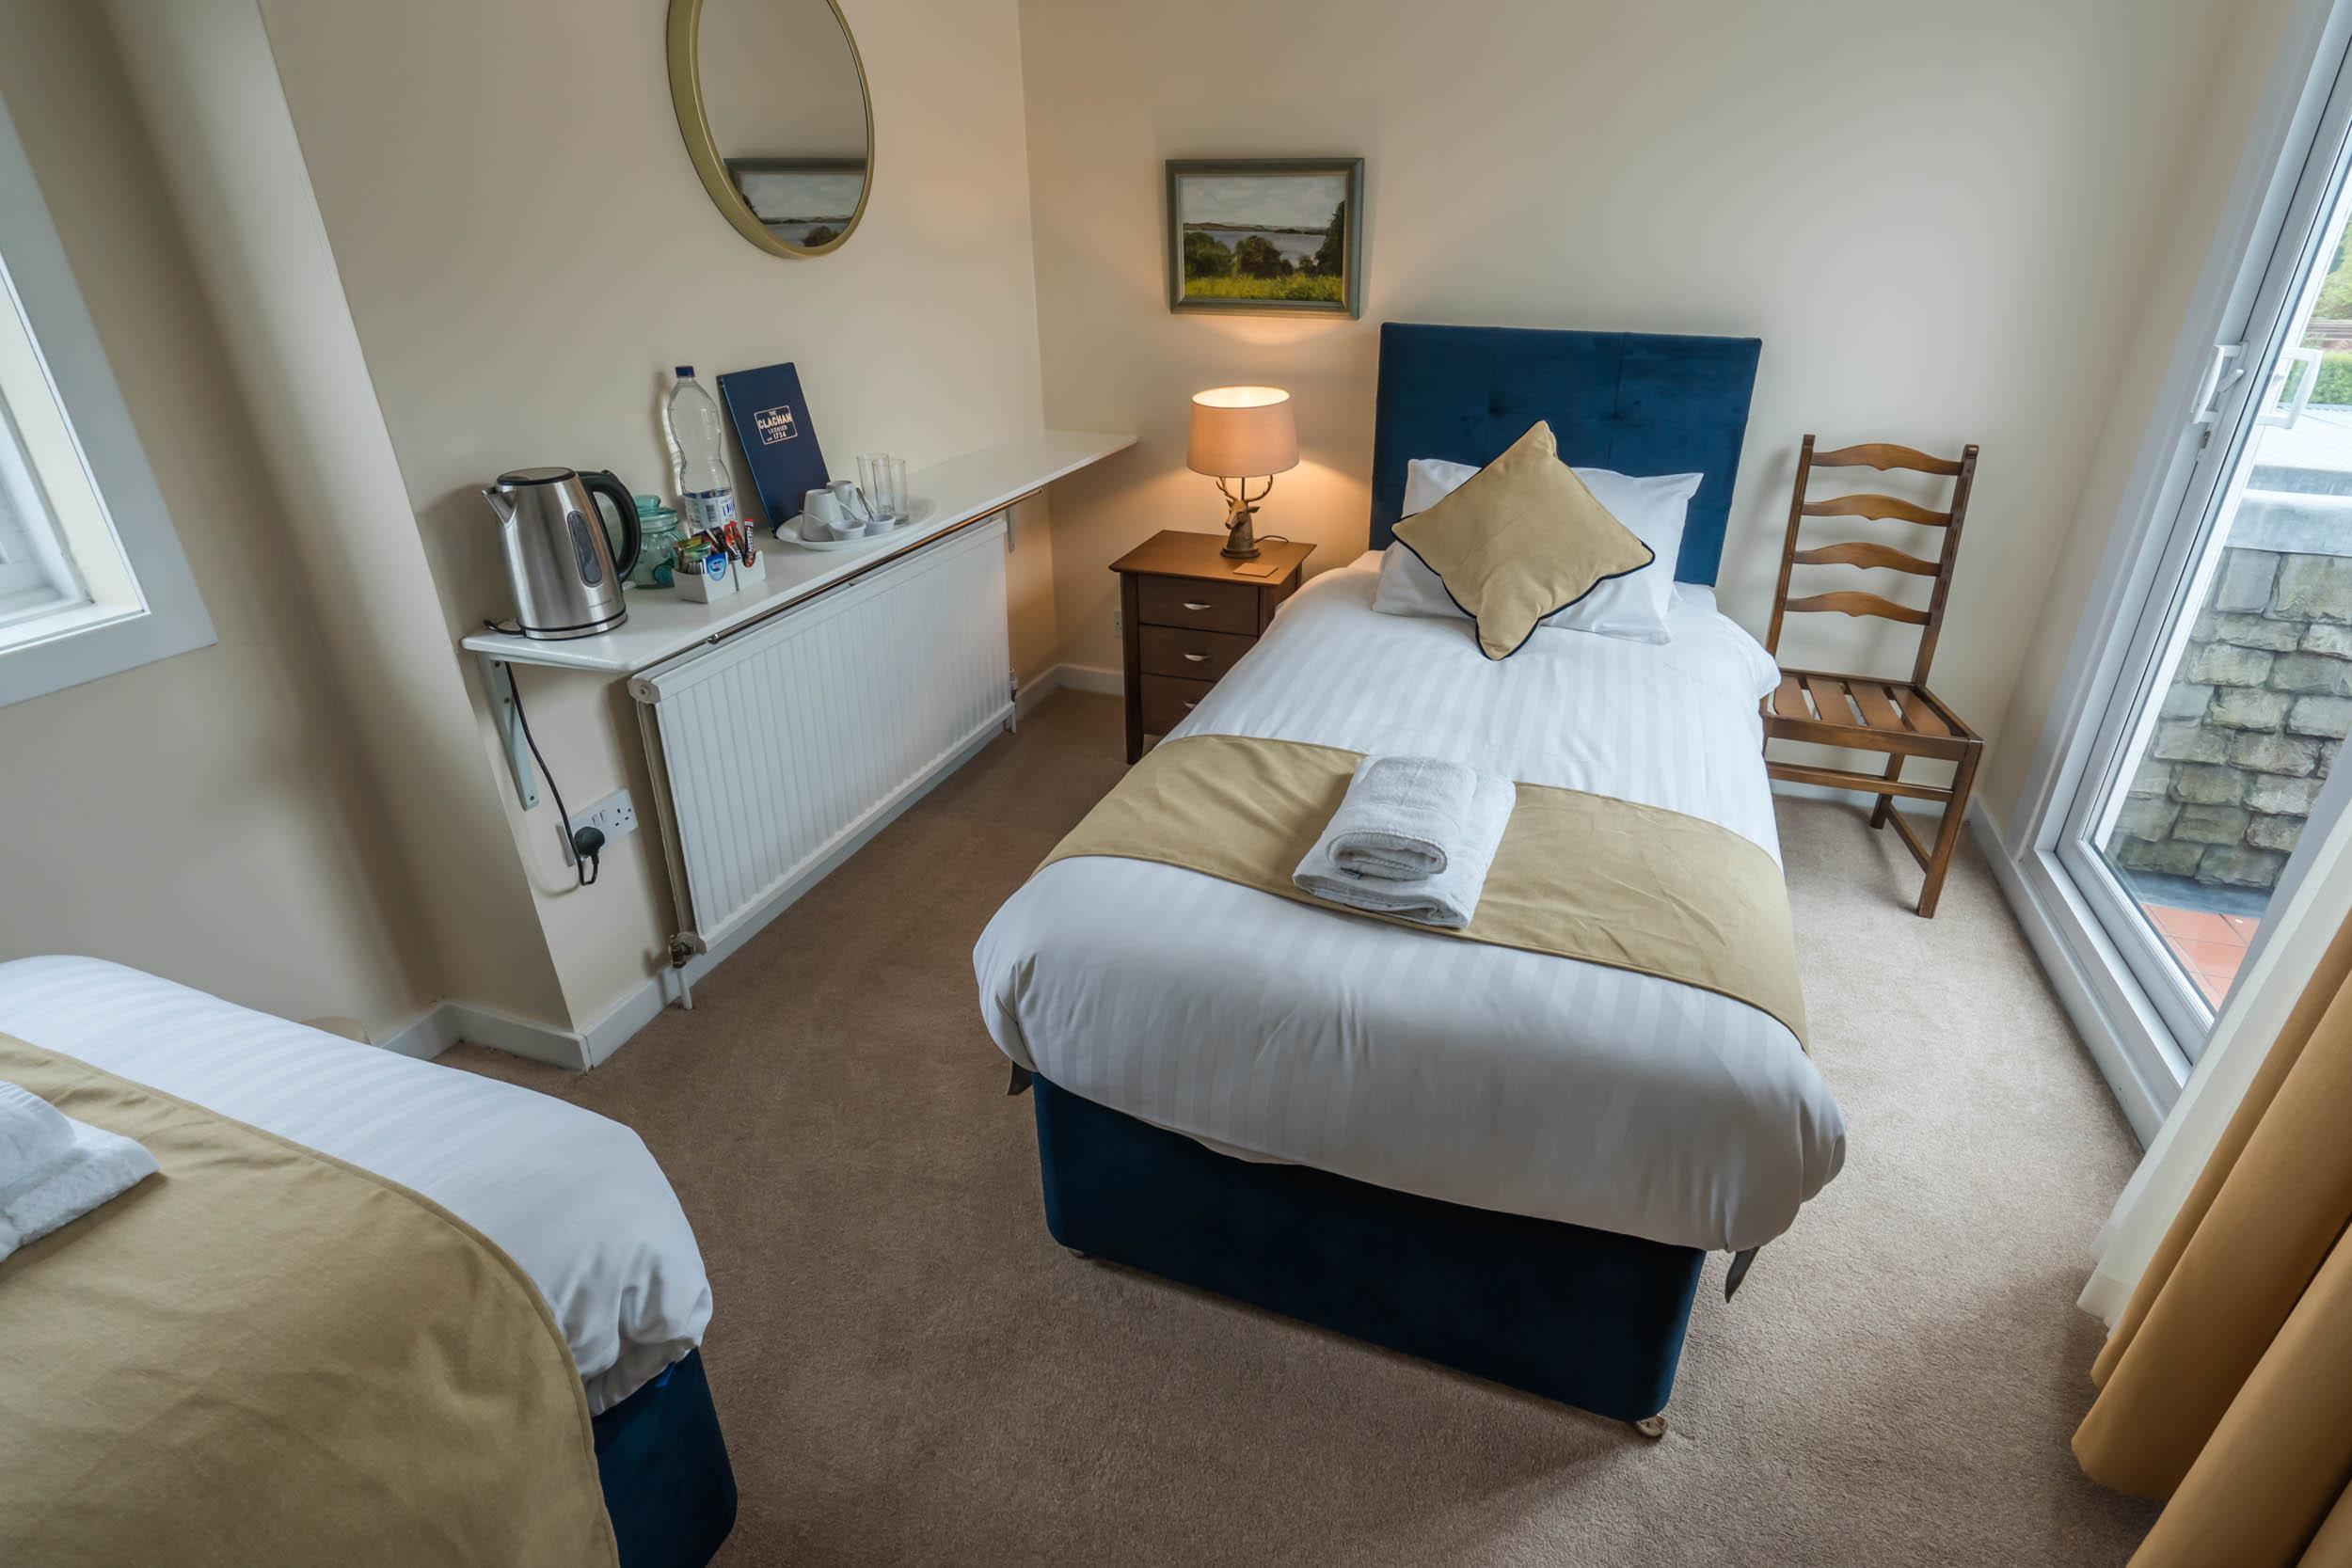 Clachan-Inn-Paul-Saunders-03193.jpg